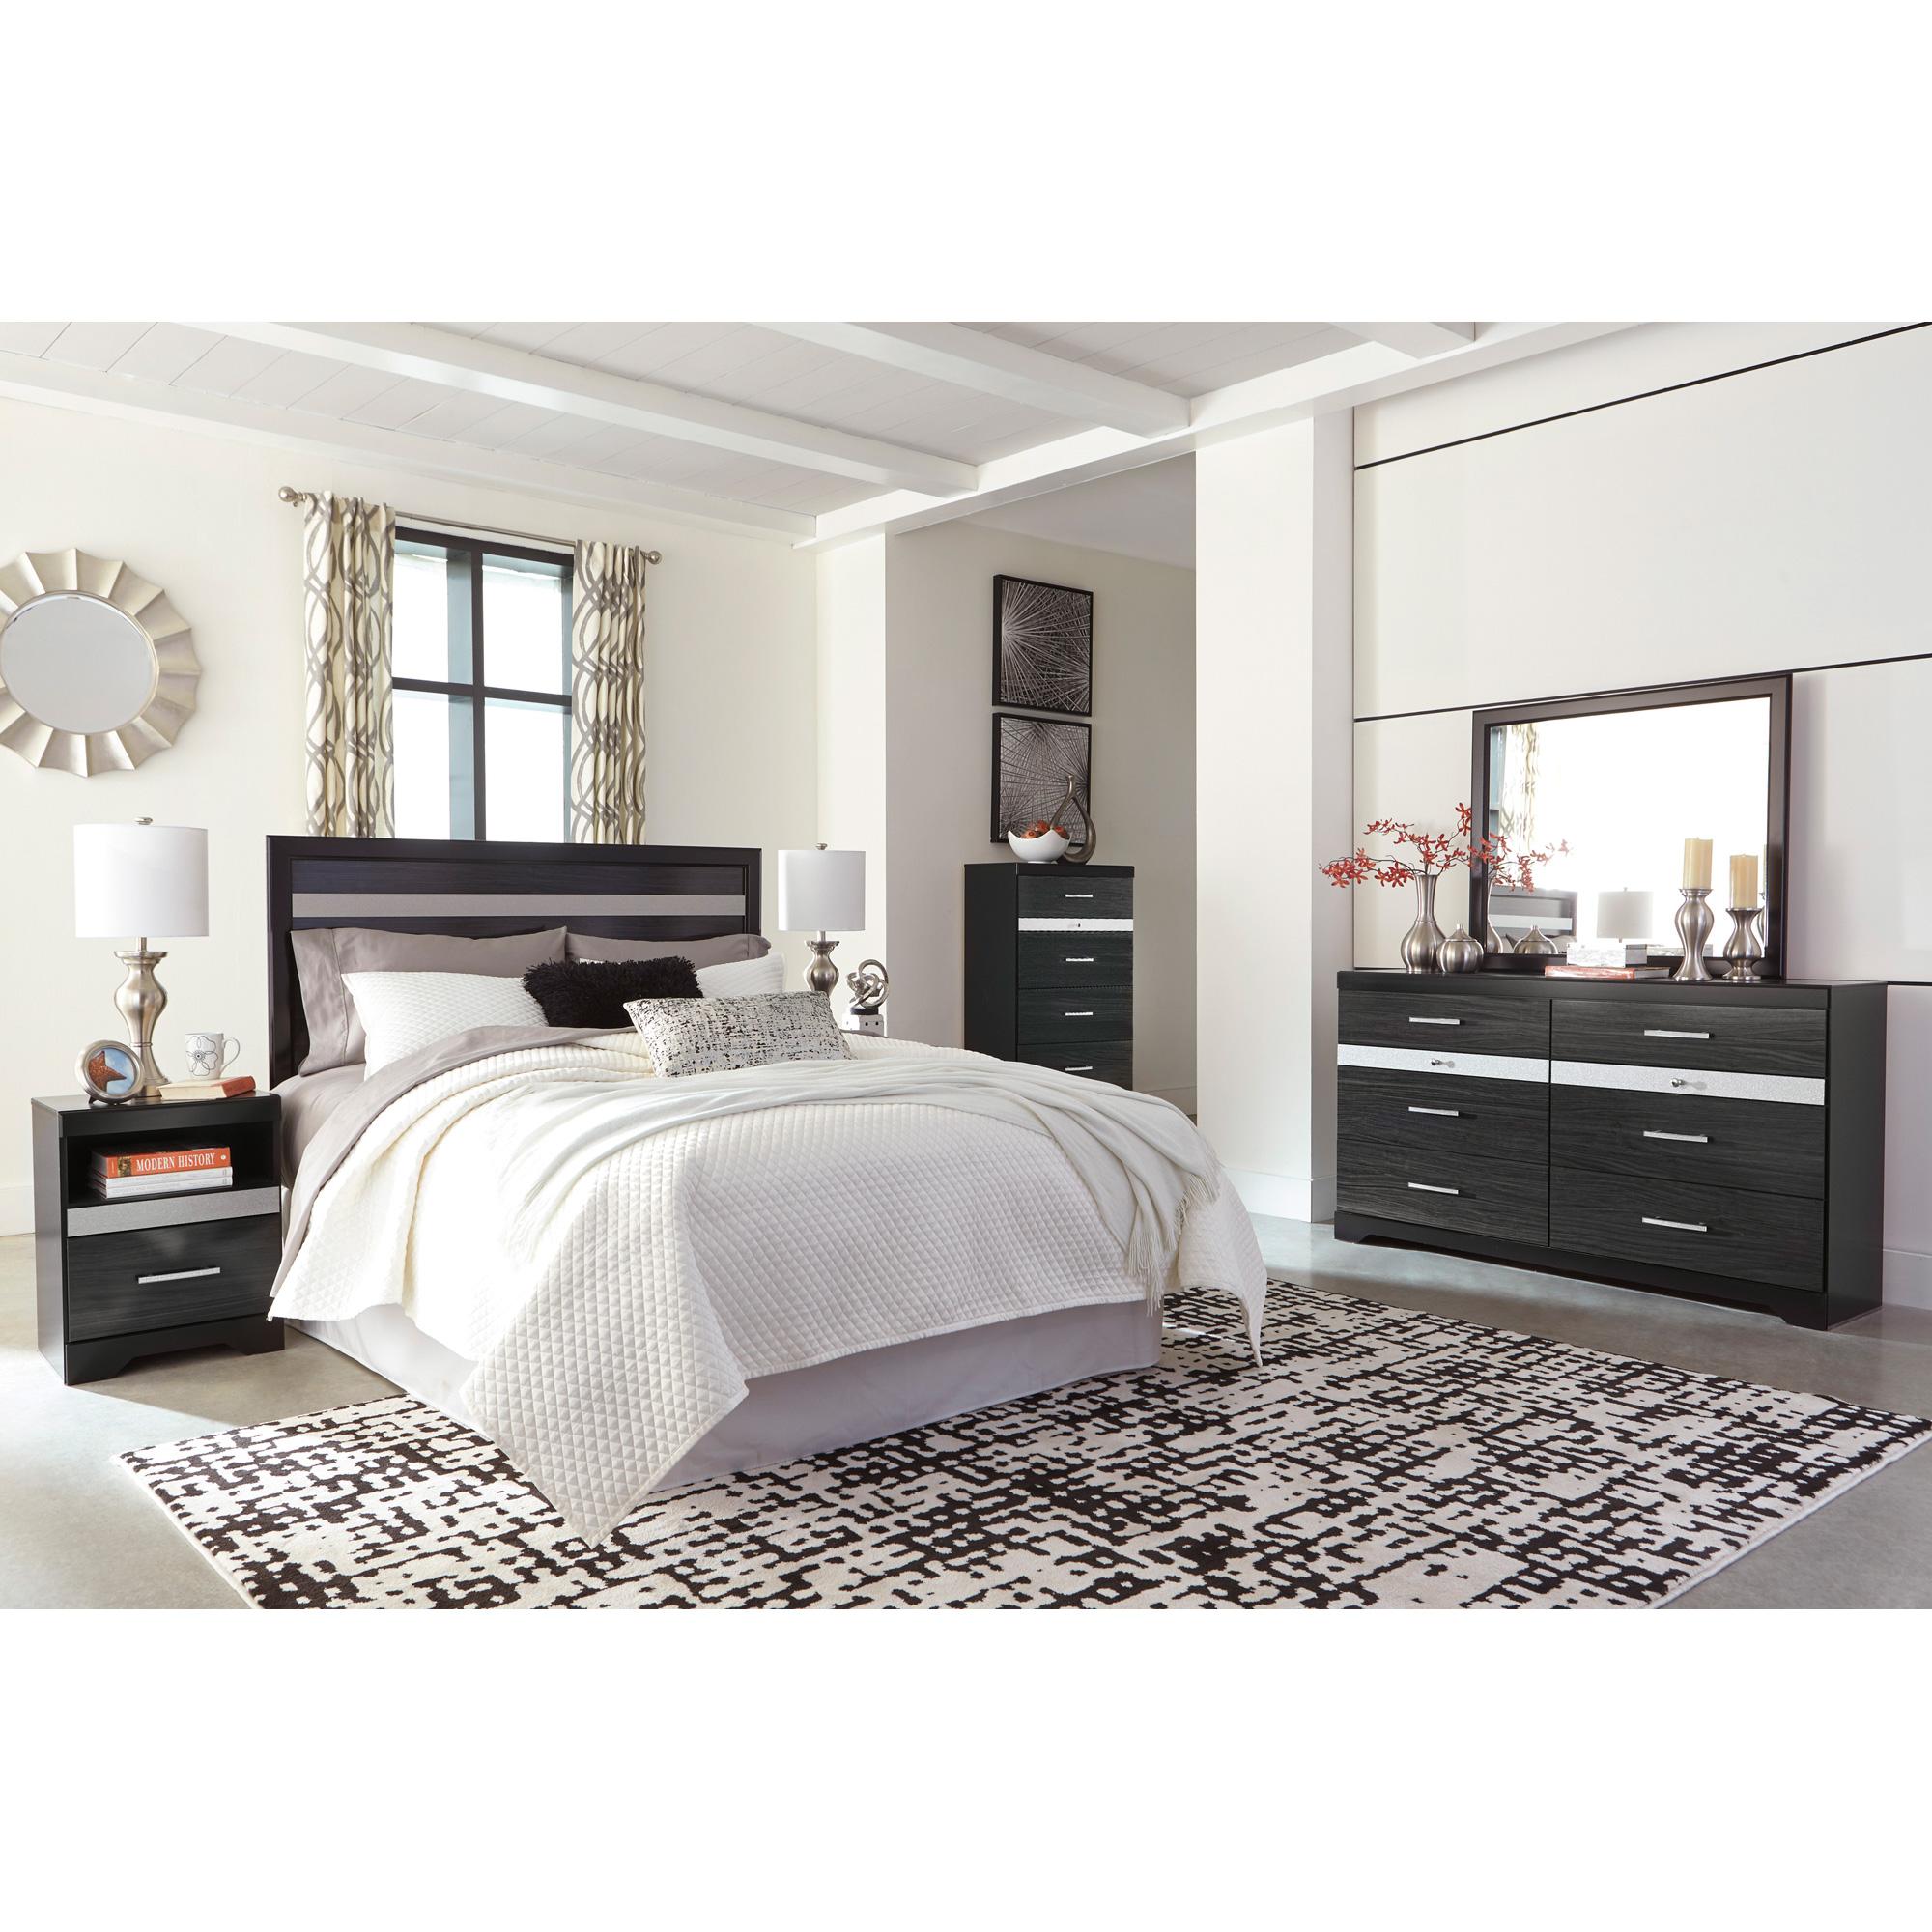 Ashley Furniture Starberry Black Queen Panel 4 Piece Room Group Bedroom Set Accuweather Shop